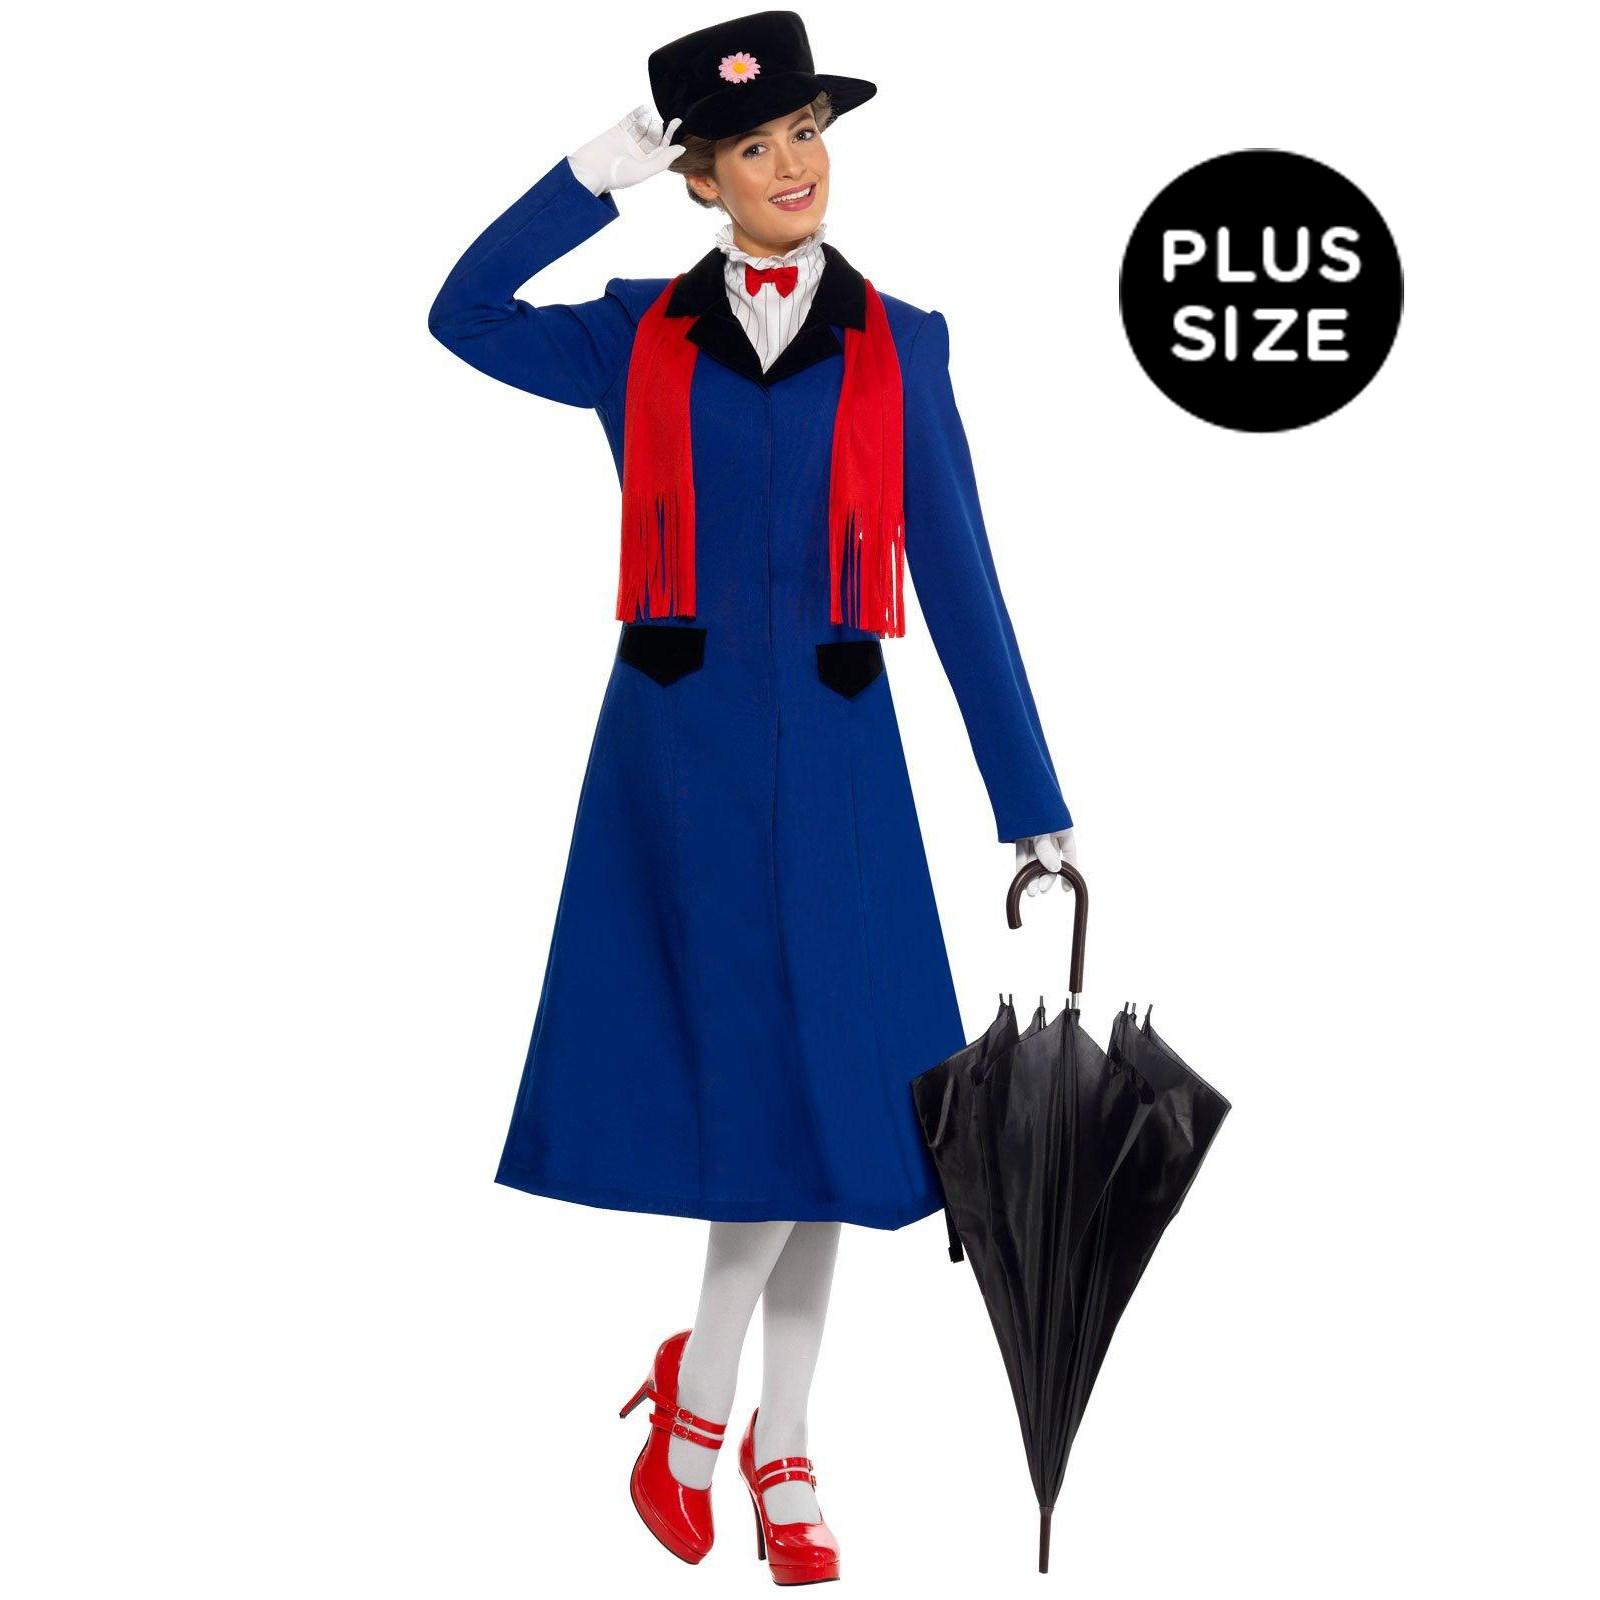 mary poppins plus adult costume. Black Bedroom Furniture Sets. Home Design Ideas